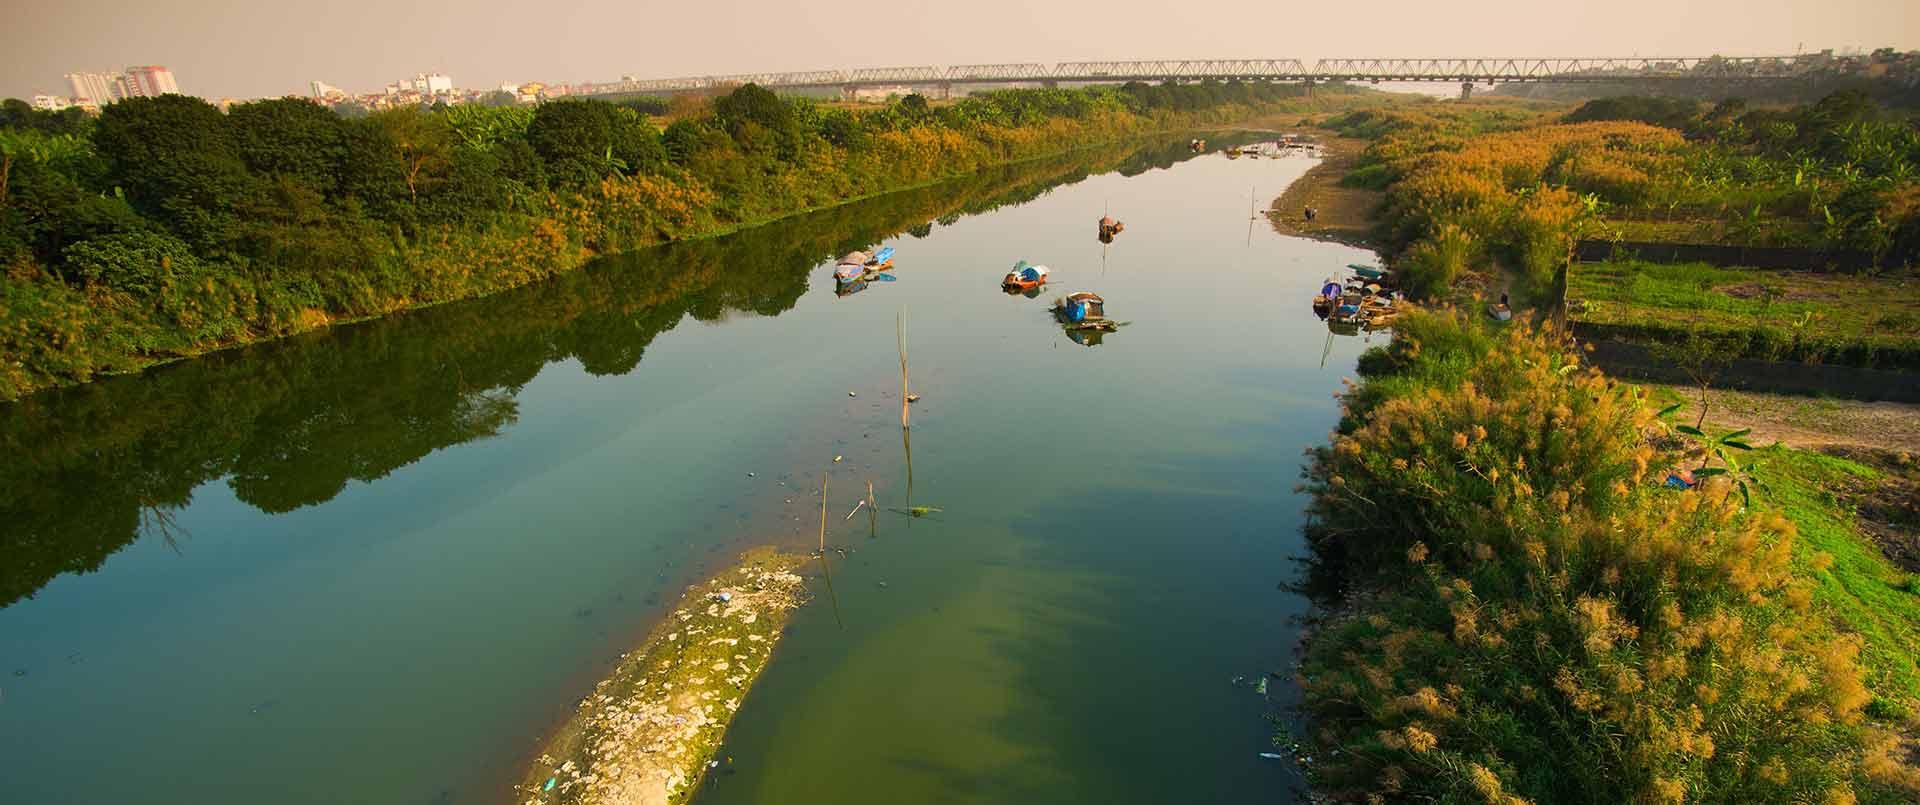 Sailing through Secret Vietnam